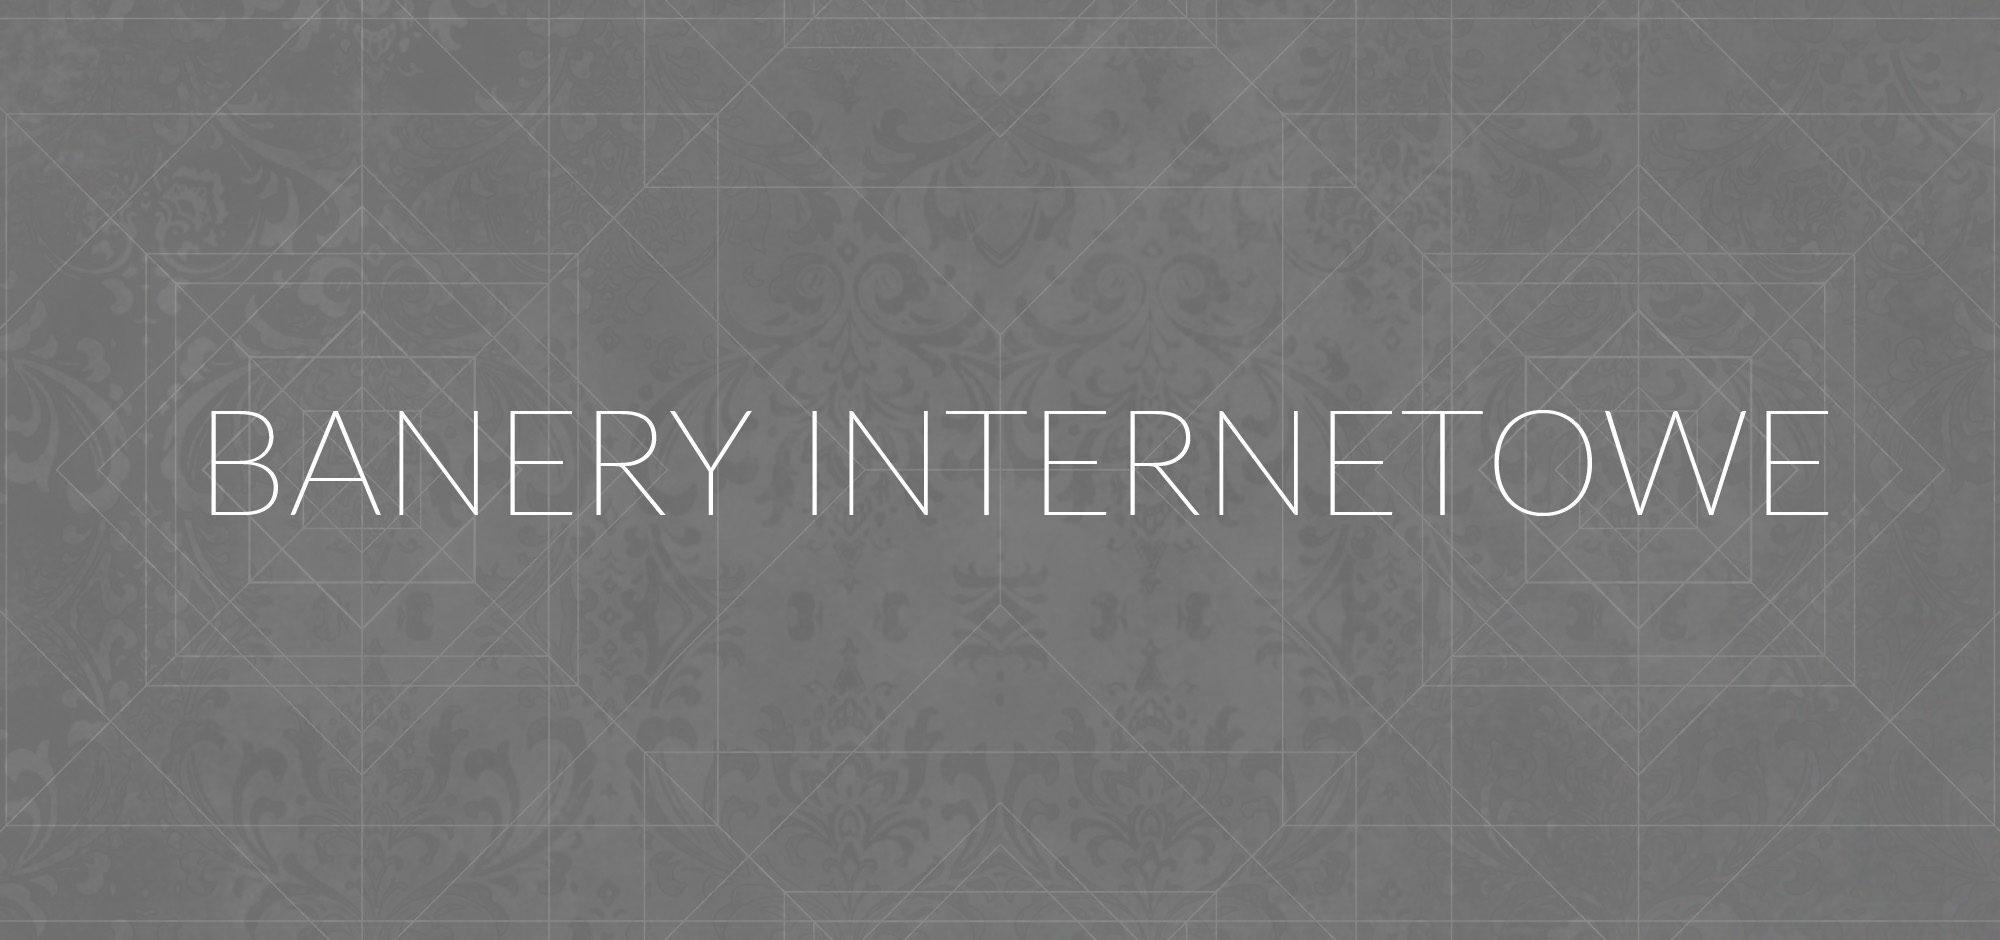 banery internetowe